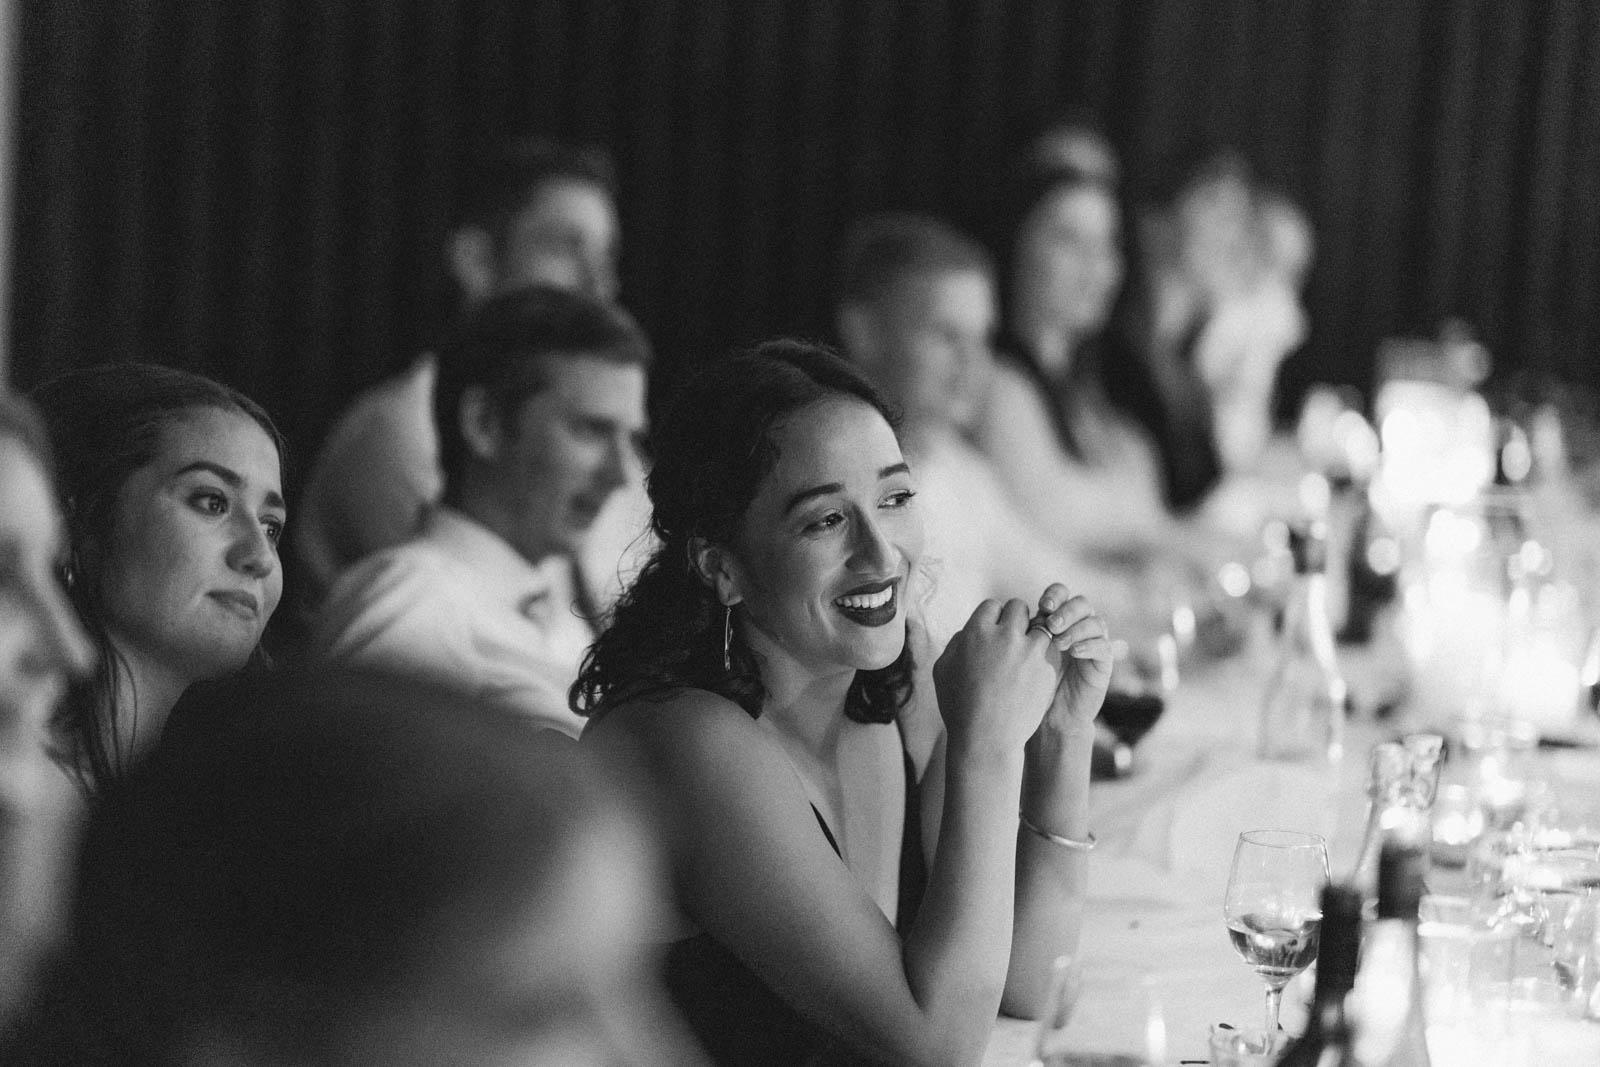 newfound-s-p-mt-maunganui-tauranga-wedding-photographer-2045-A9_09140